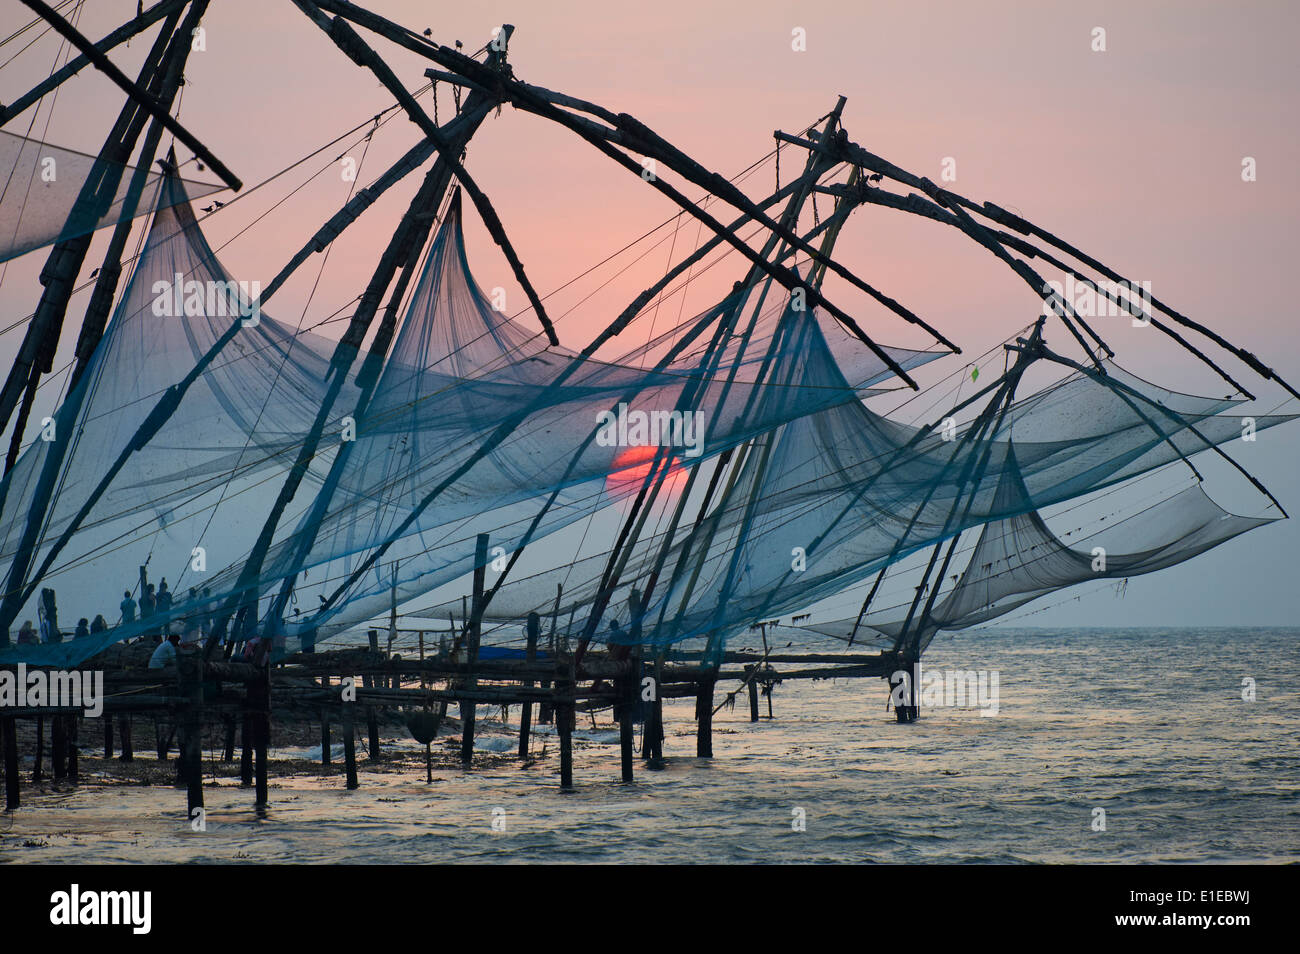 India, Kerala State, Fort cochin or Kochi, Chinese fishing nets - Stock Image